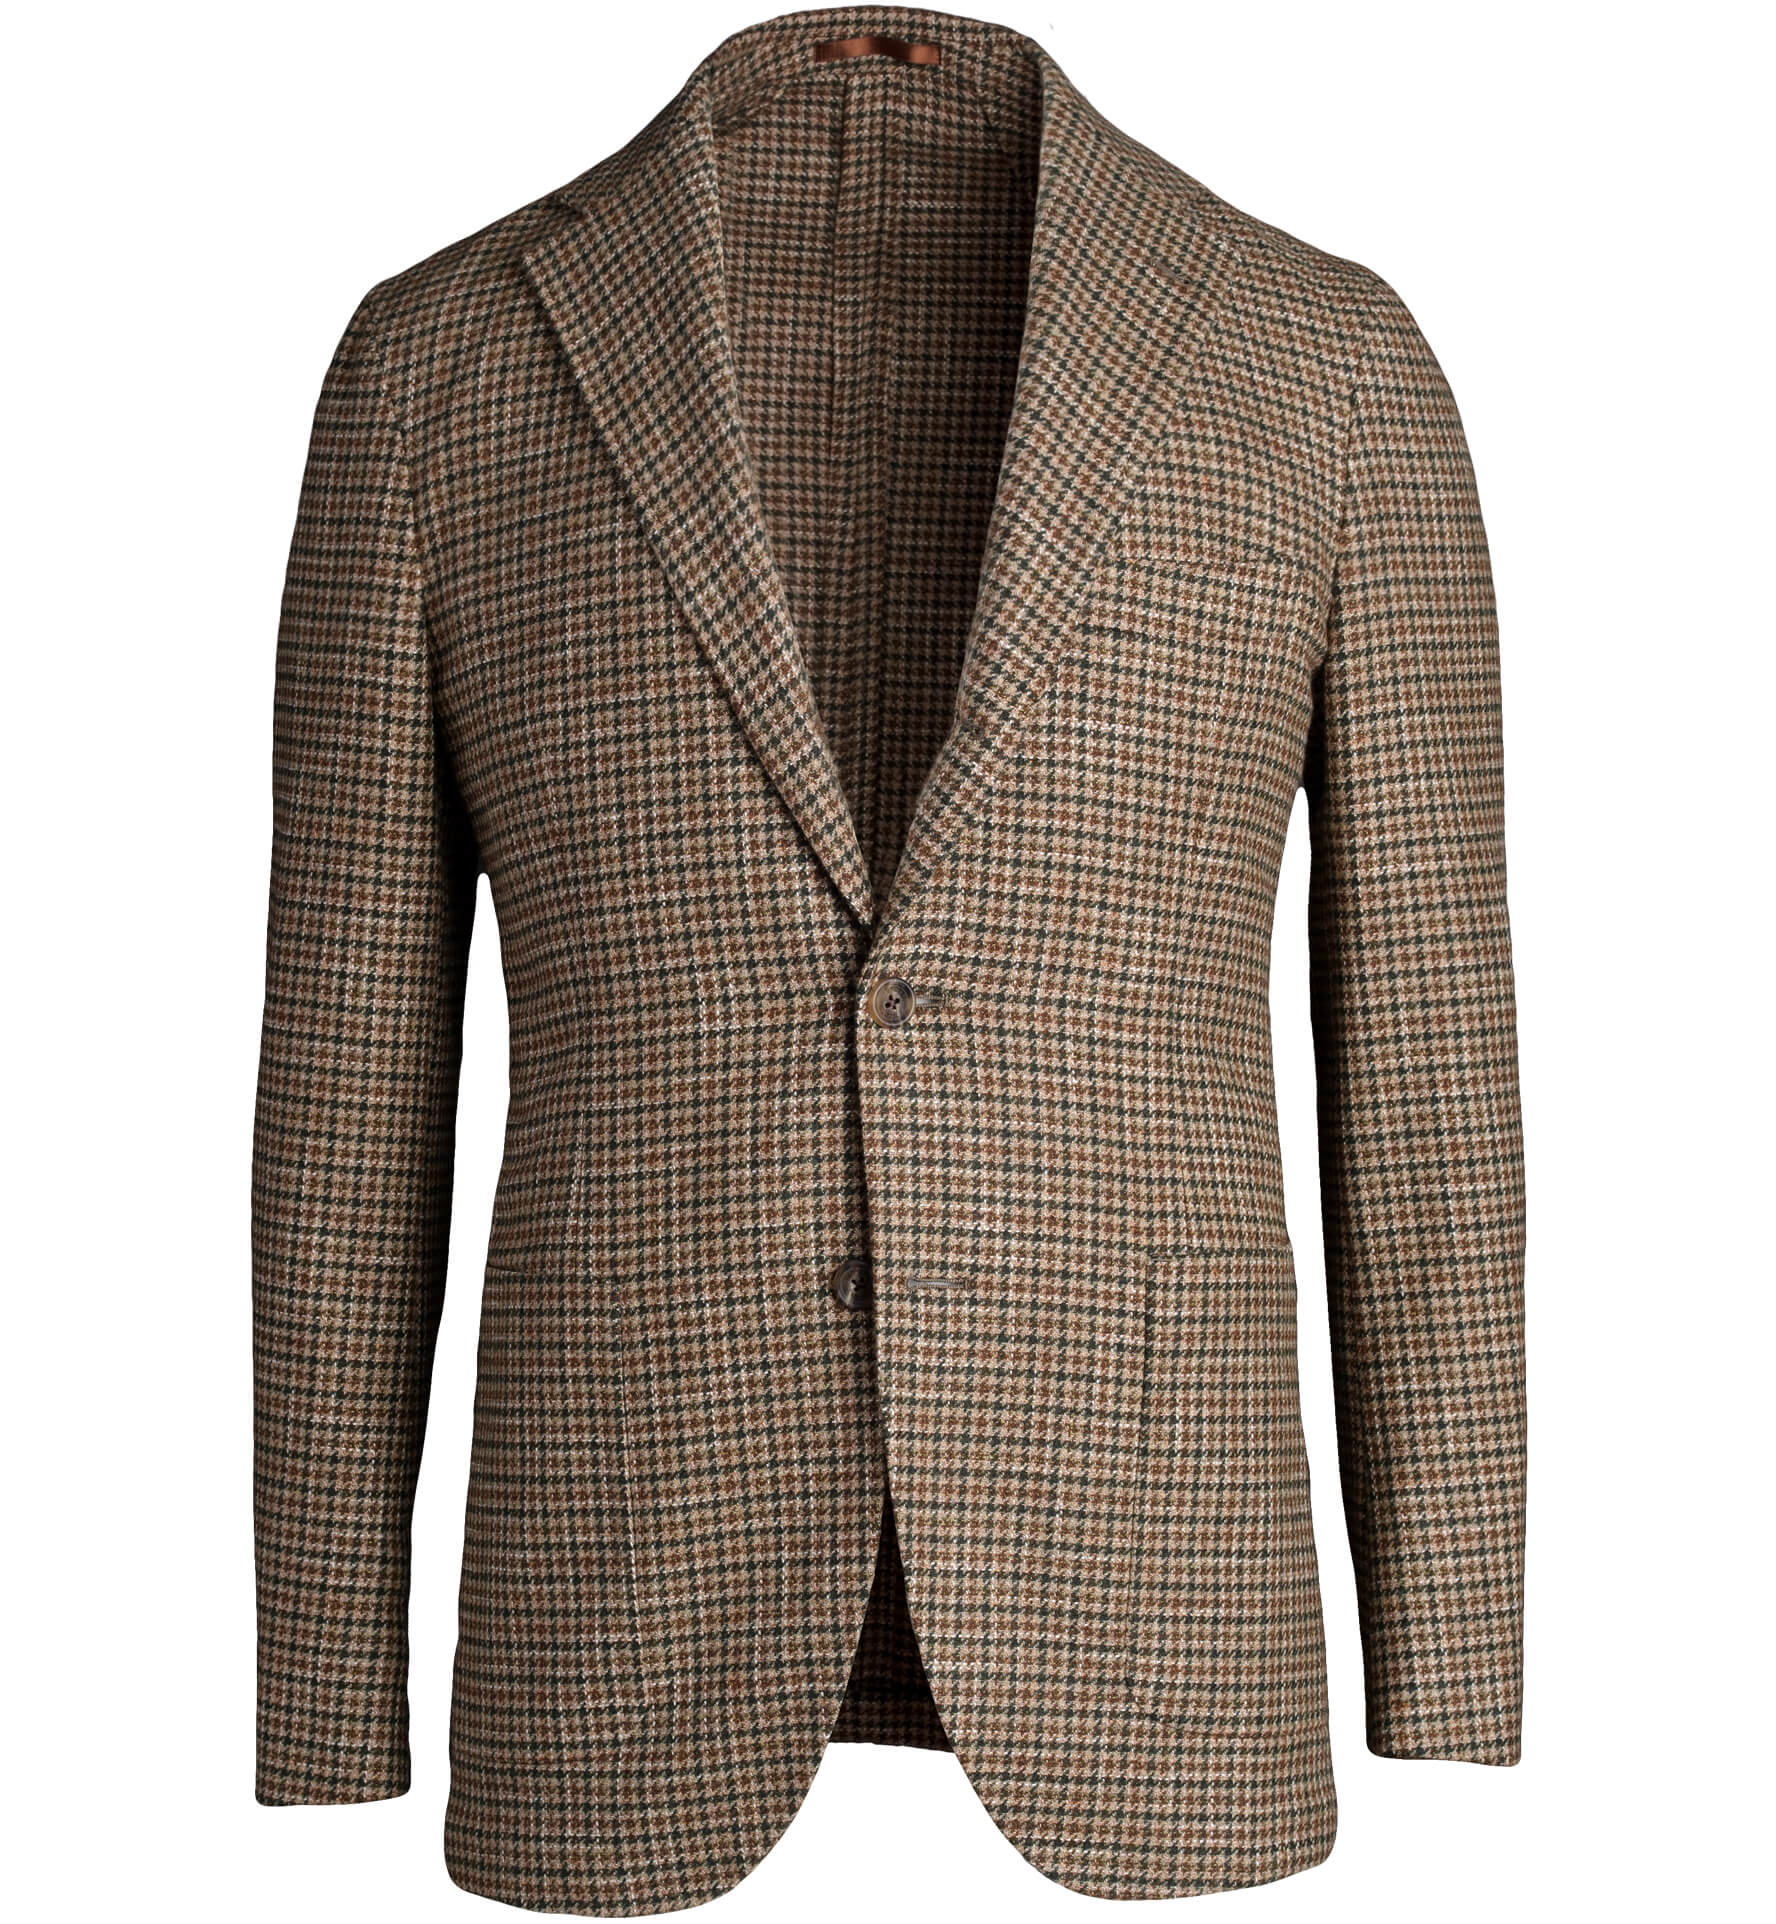 Zoom Image of Waverly Brown Gun Check Wool Jacket